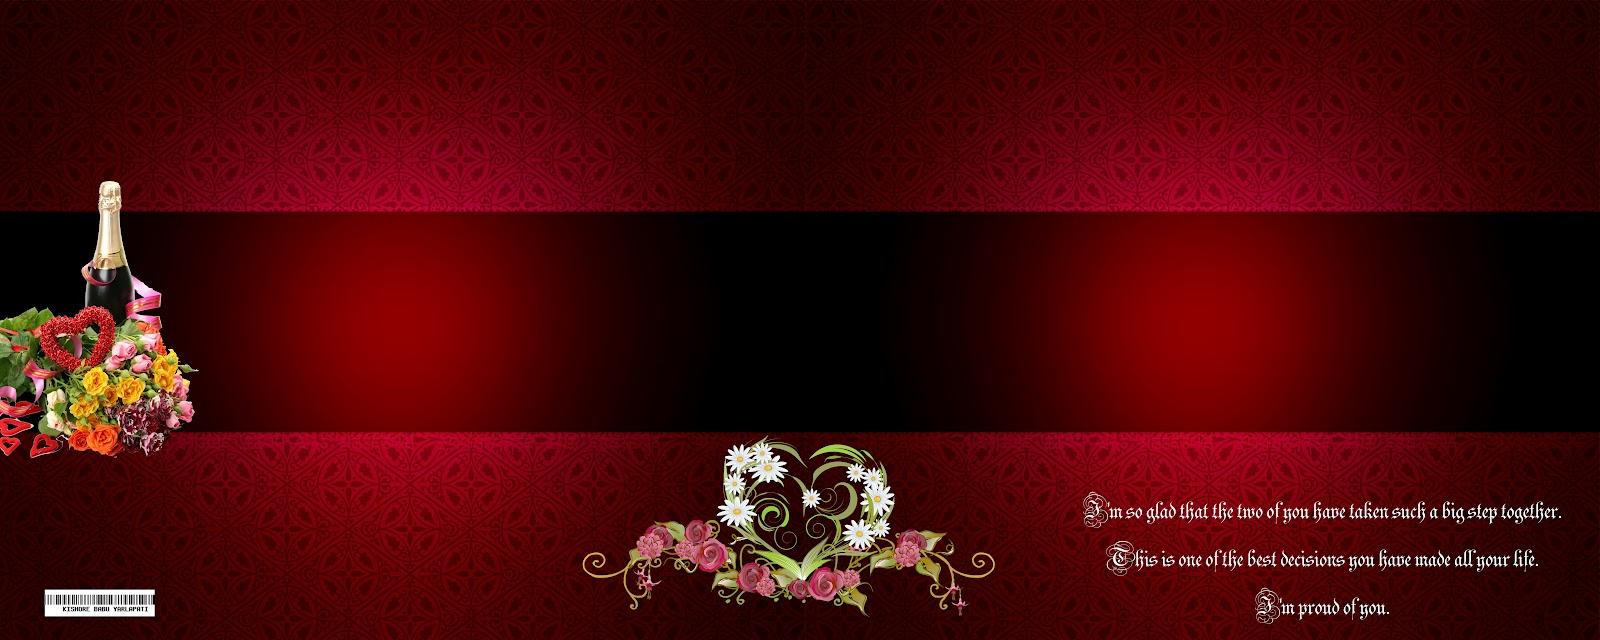 Kishore Babu Yarlapati's Designs: 12X30 Backgrounds